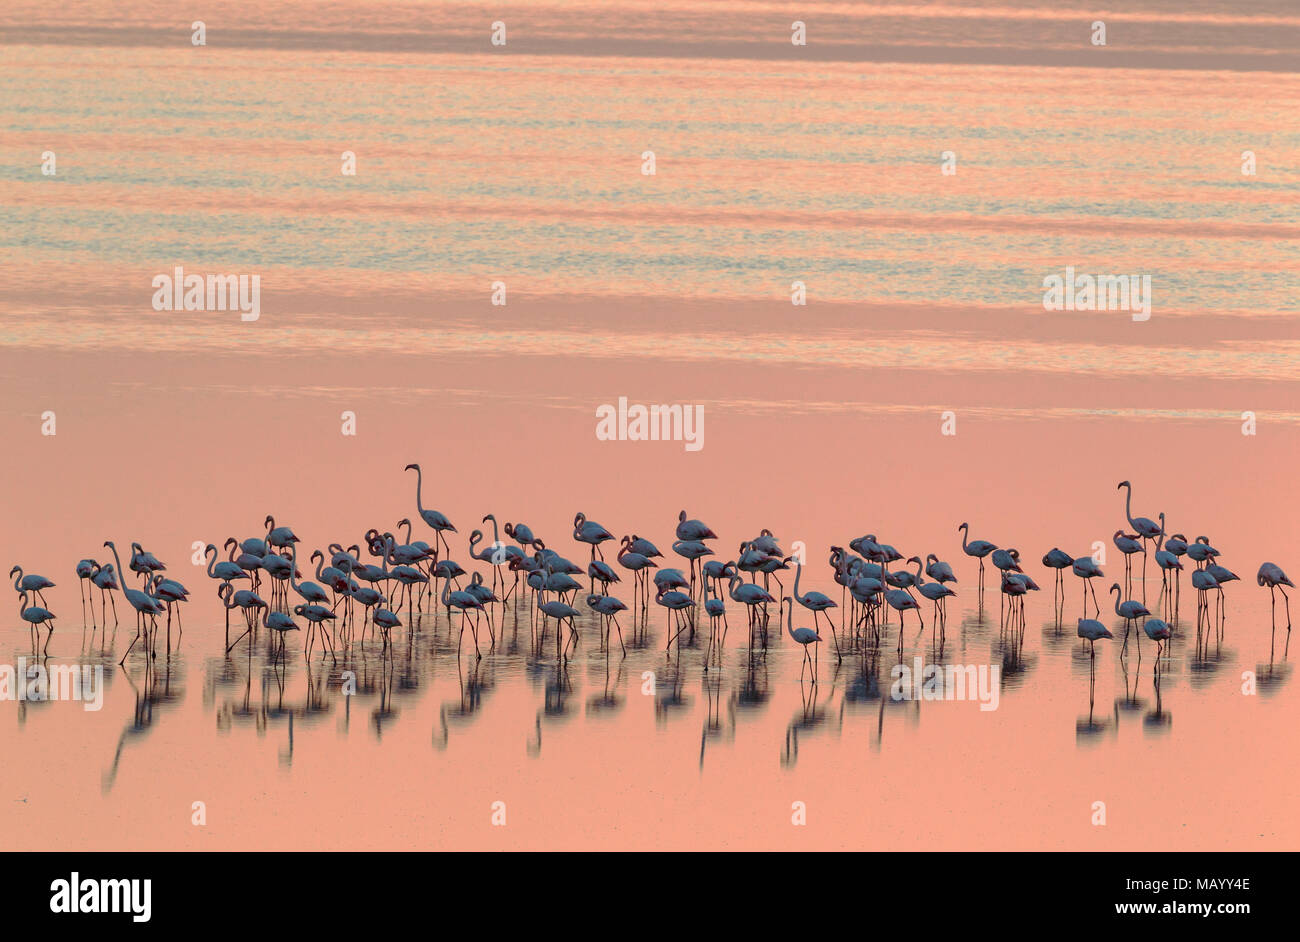 Greater Flamingos (Phoenicopterus roseus), resting at dusk, Laguna de Fuente de Piedra, Malaga province, Andalusia, Spain - Stock Image